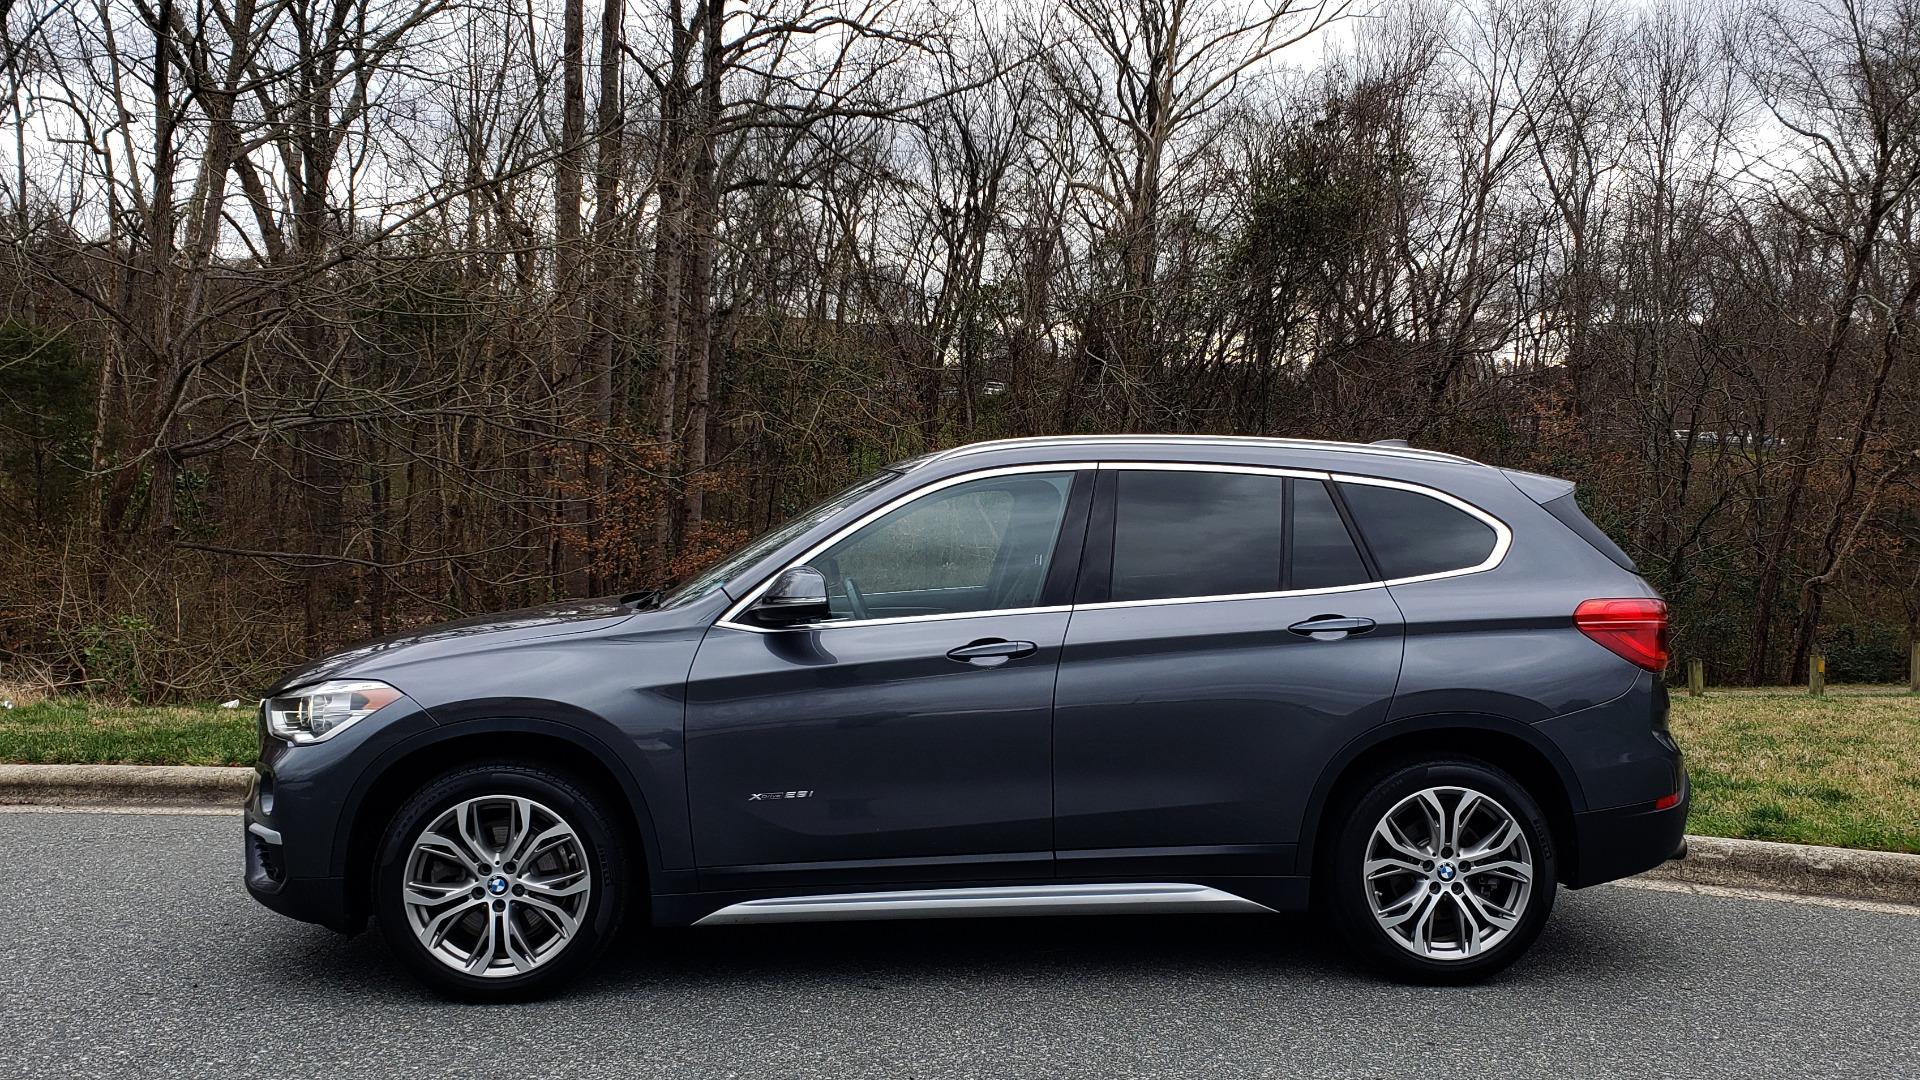 Used 2017 BMW X1 XDRIVE28I / PREM PKG / DRIVER ASST / NAV / CLD WTHR for sale Sold at Formula Imports in Charlotte NC 28227 2